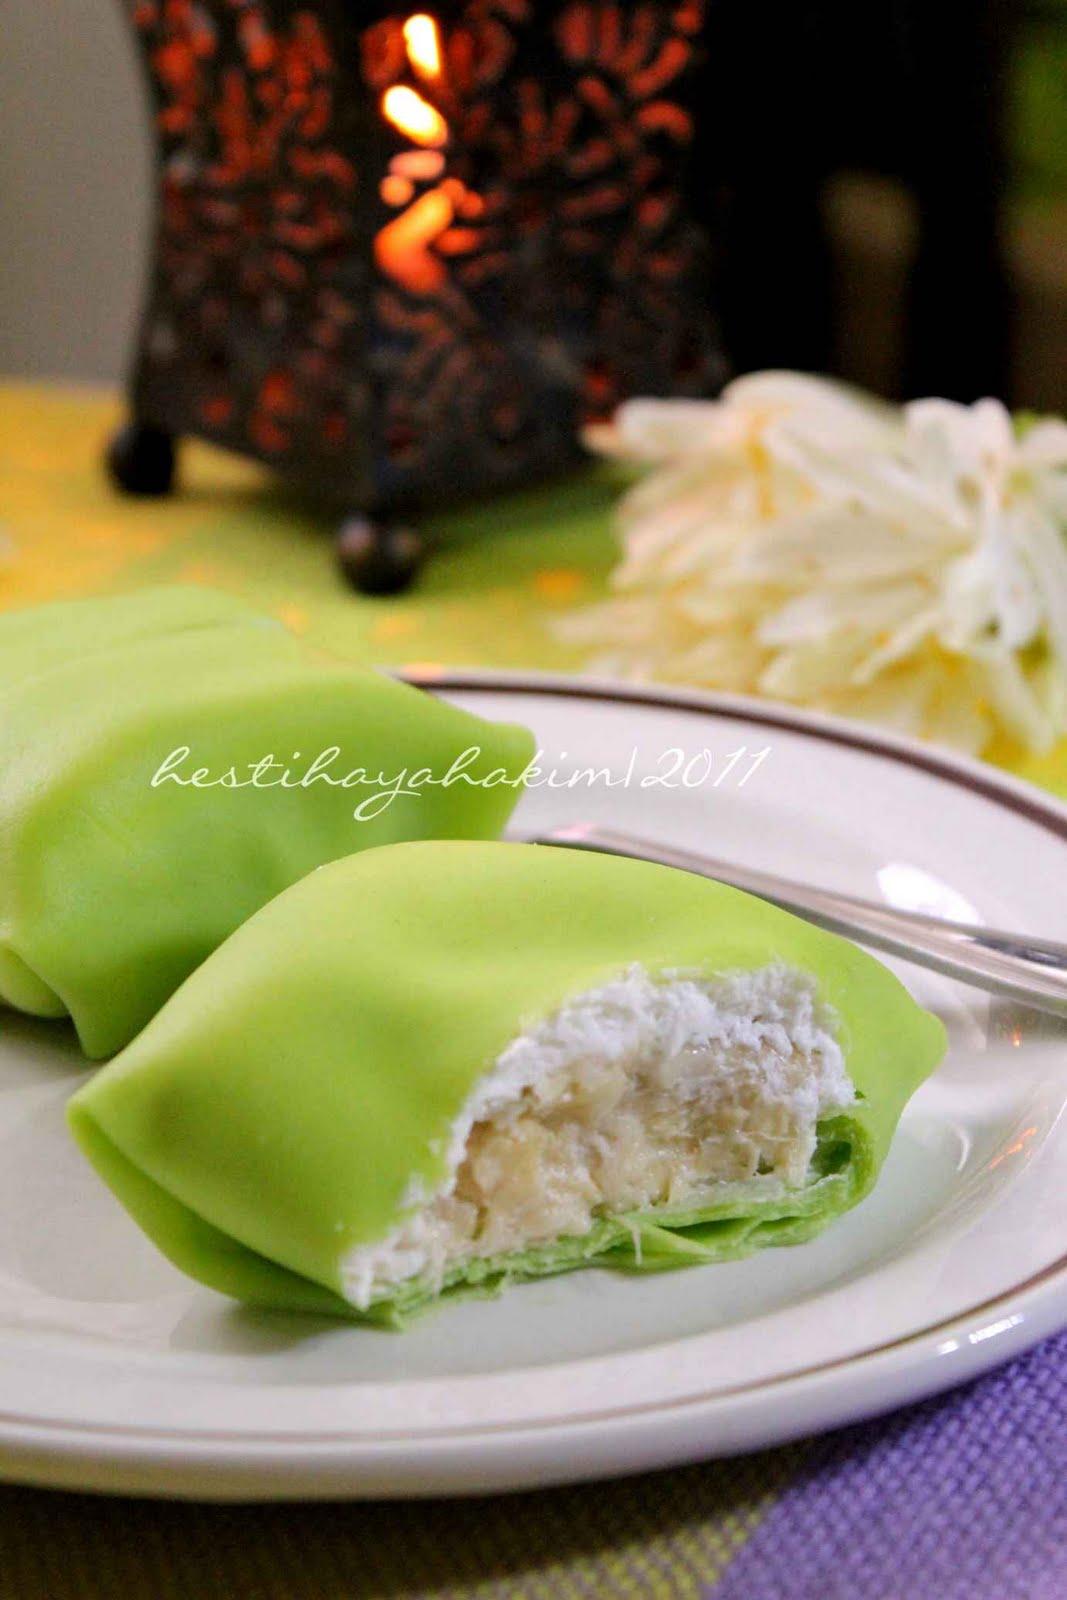 HESTI'S KITCHEN : yummy for your tummy: Durian Pancake1067